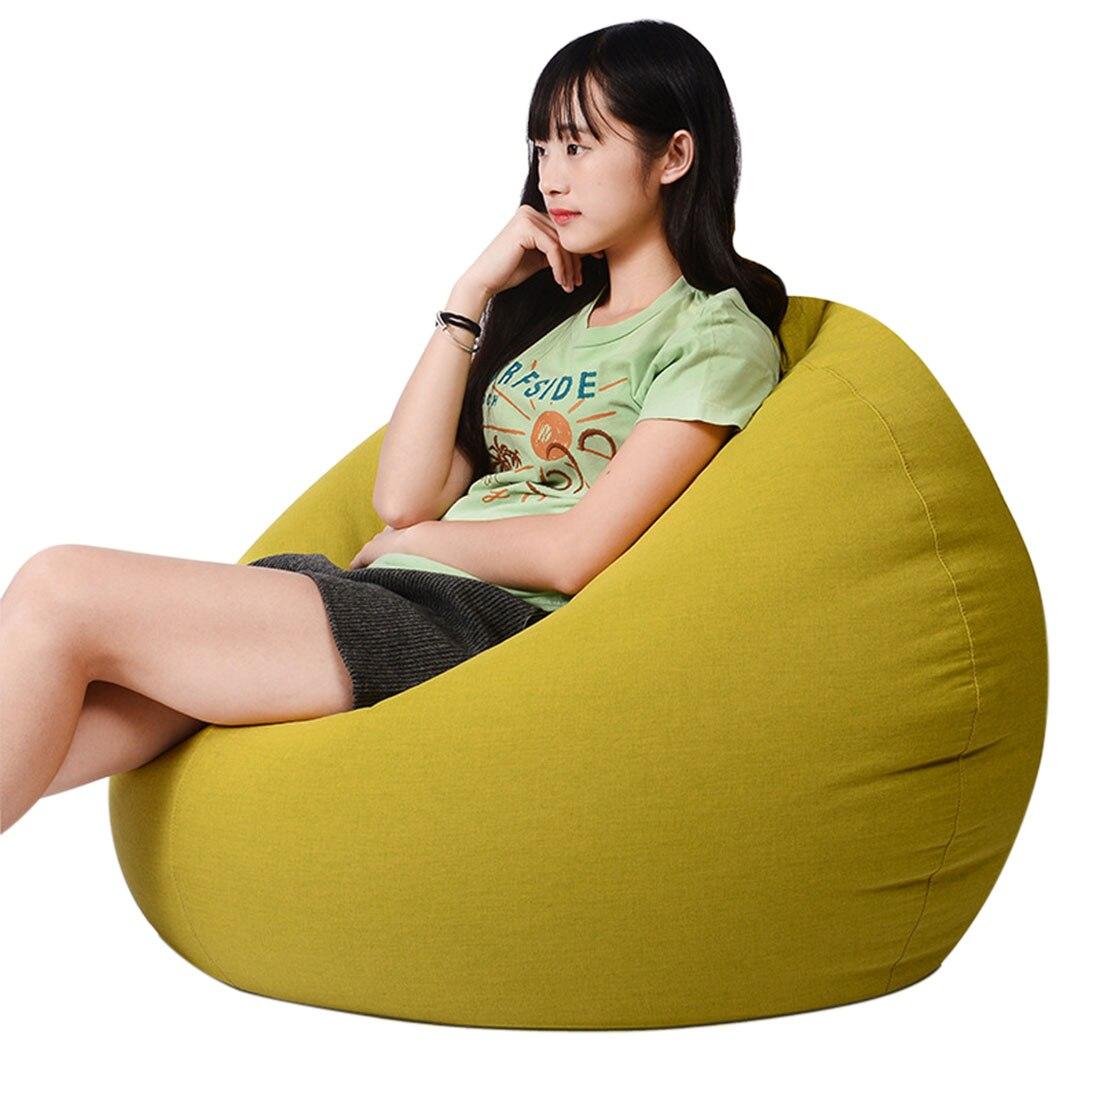 Fabulous Volwassenen Kinderen Bean Bag Stoel Sofa Woonkamer Lounger Creativecarmelina Interior Chair Design Creativecarmelinacom